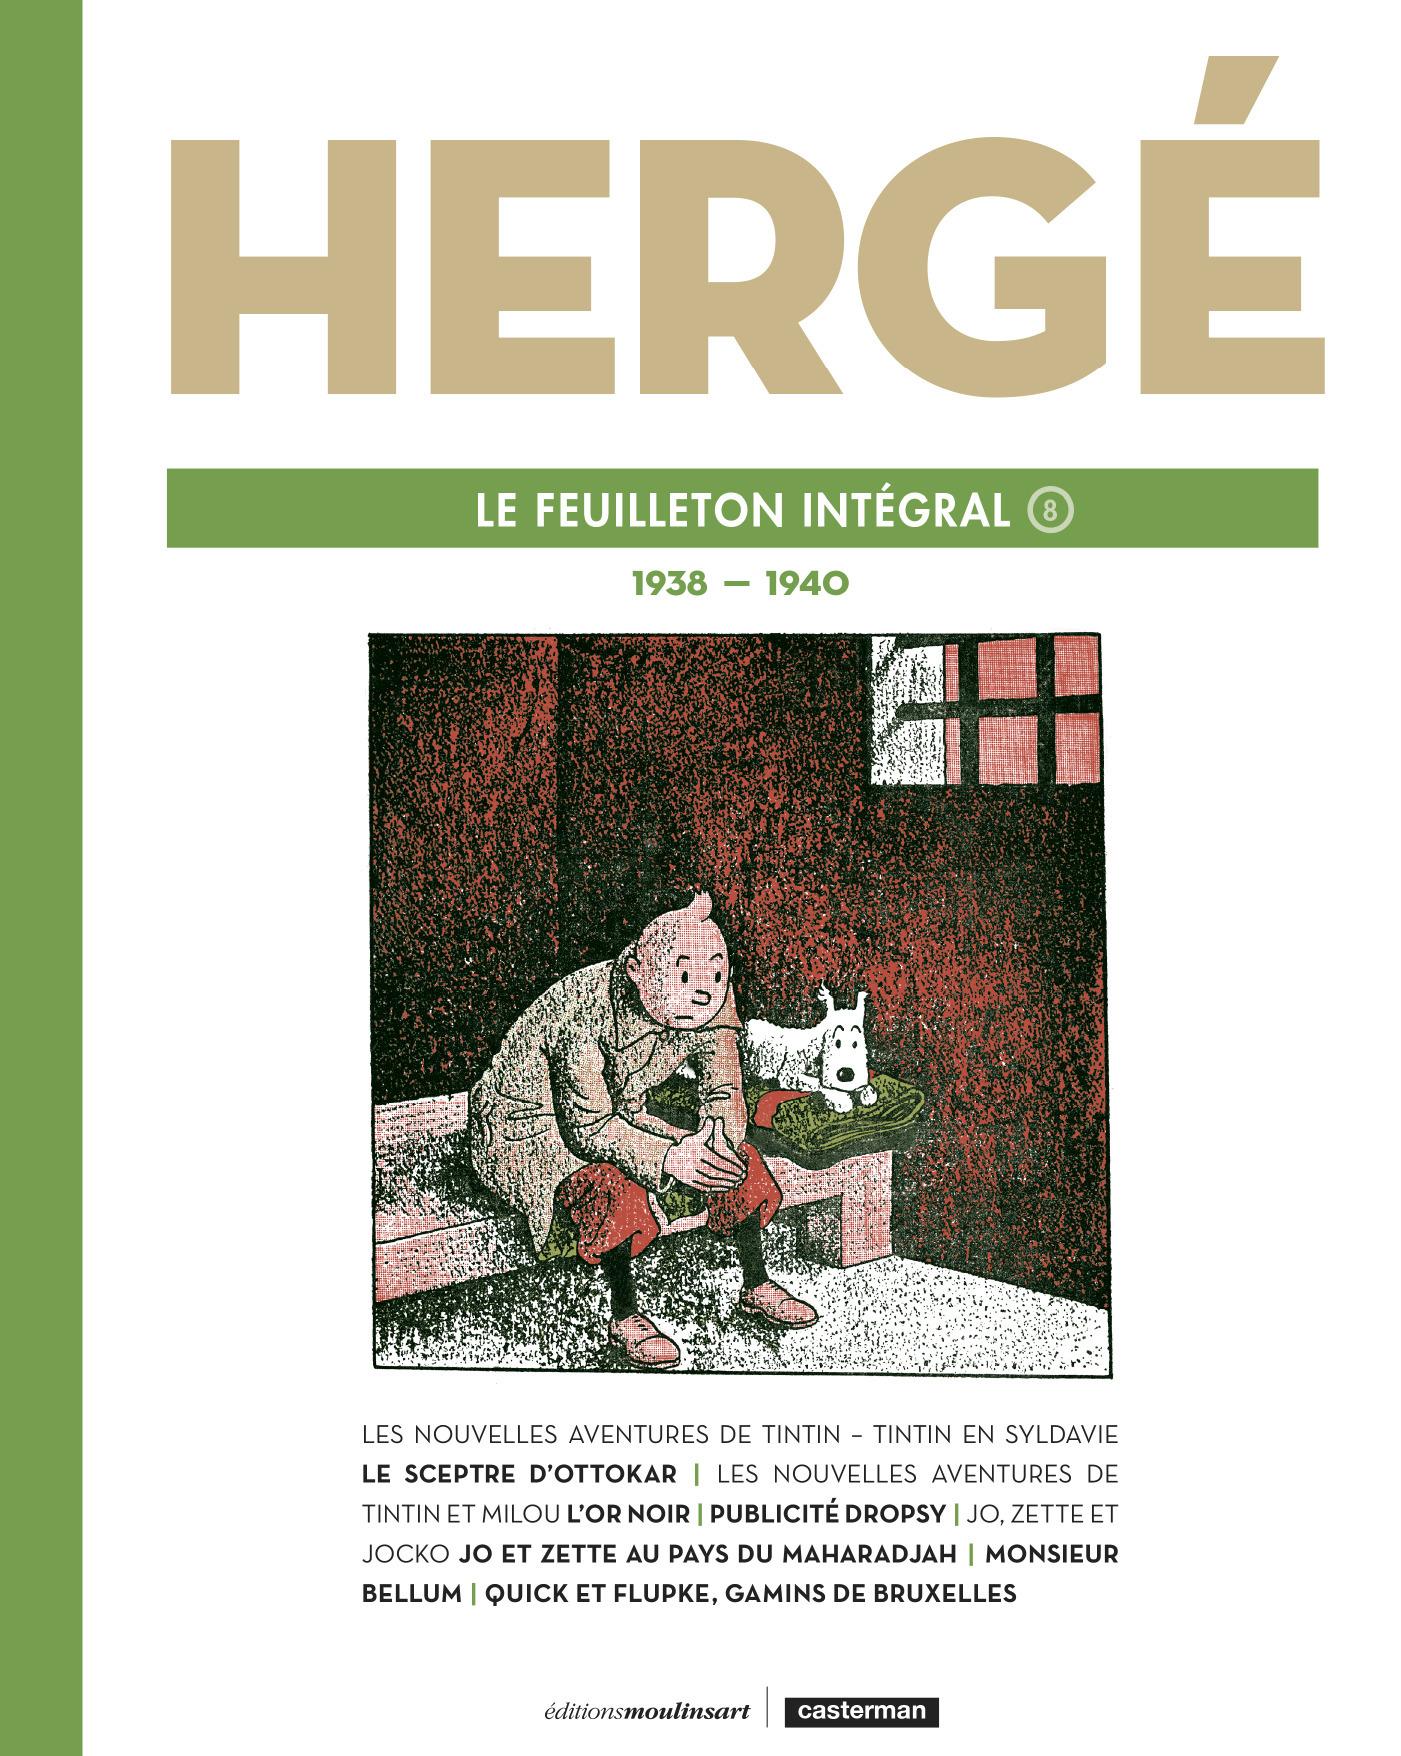 HERGE, LE FEUILLETON INTEGRAL - 1938 - 1940